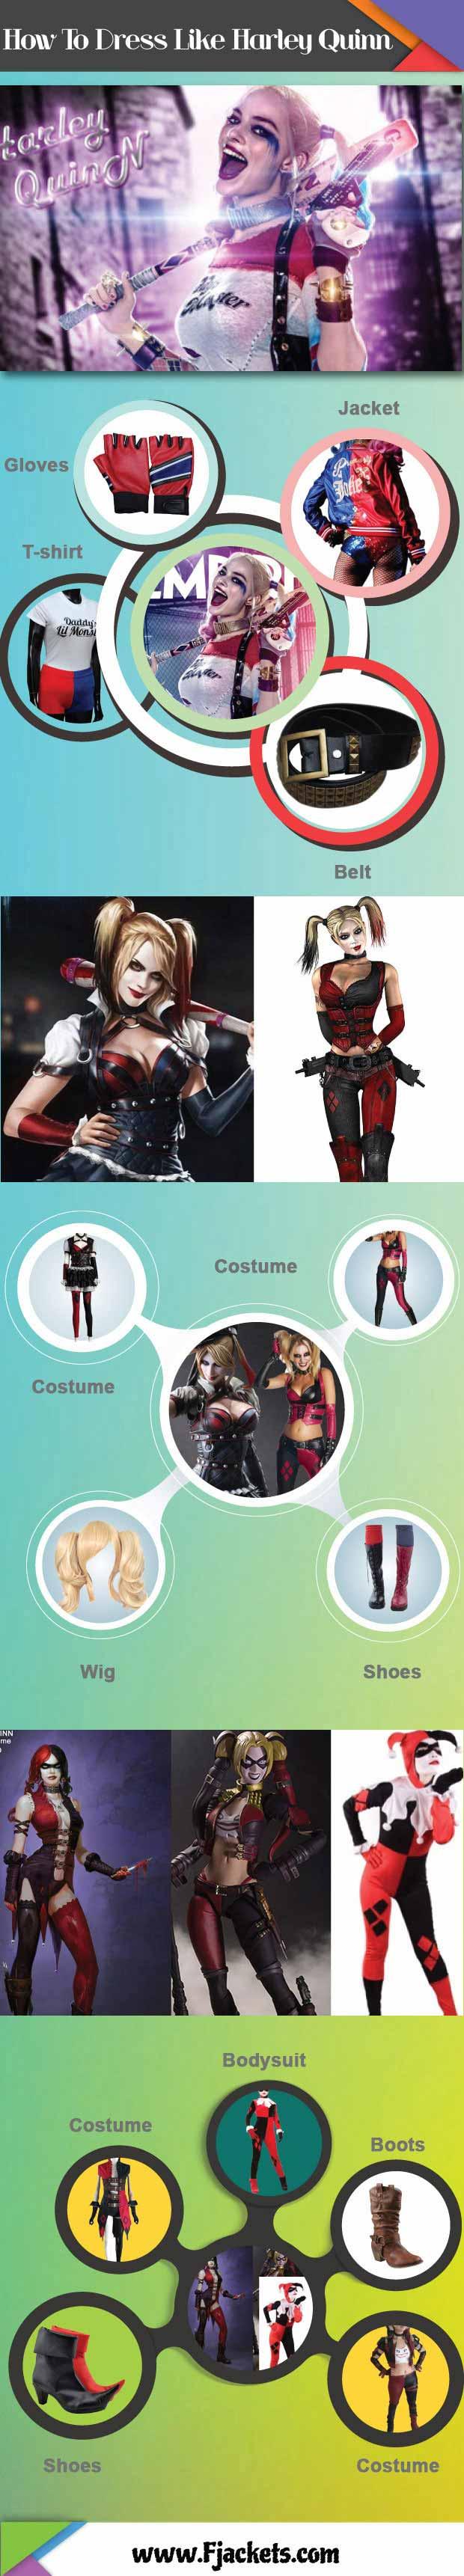 harley-quinn-infographic